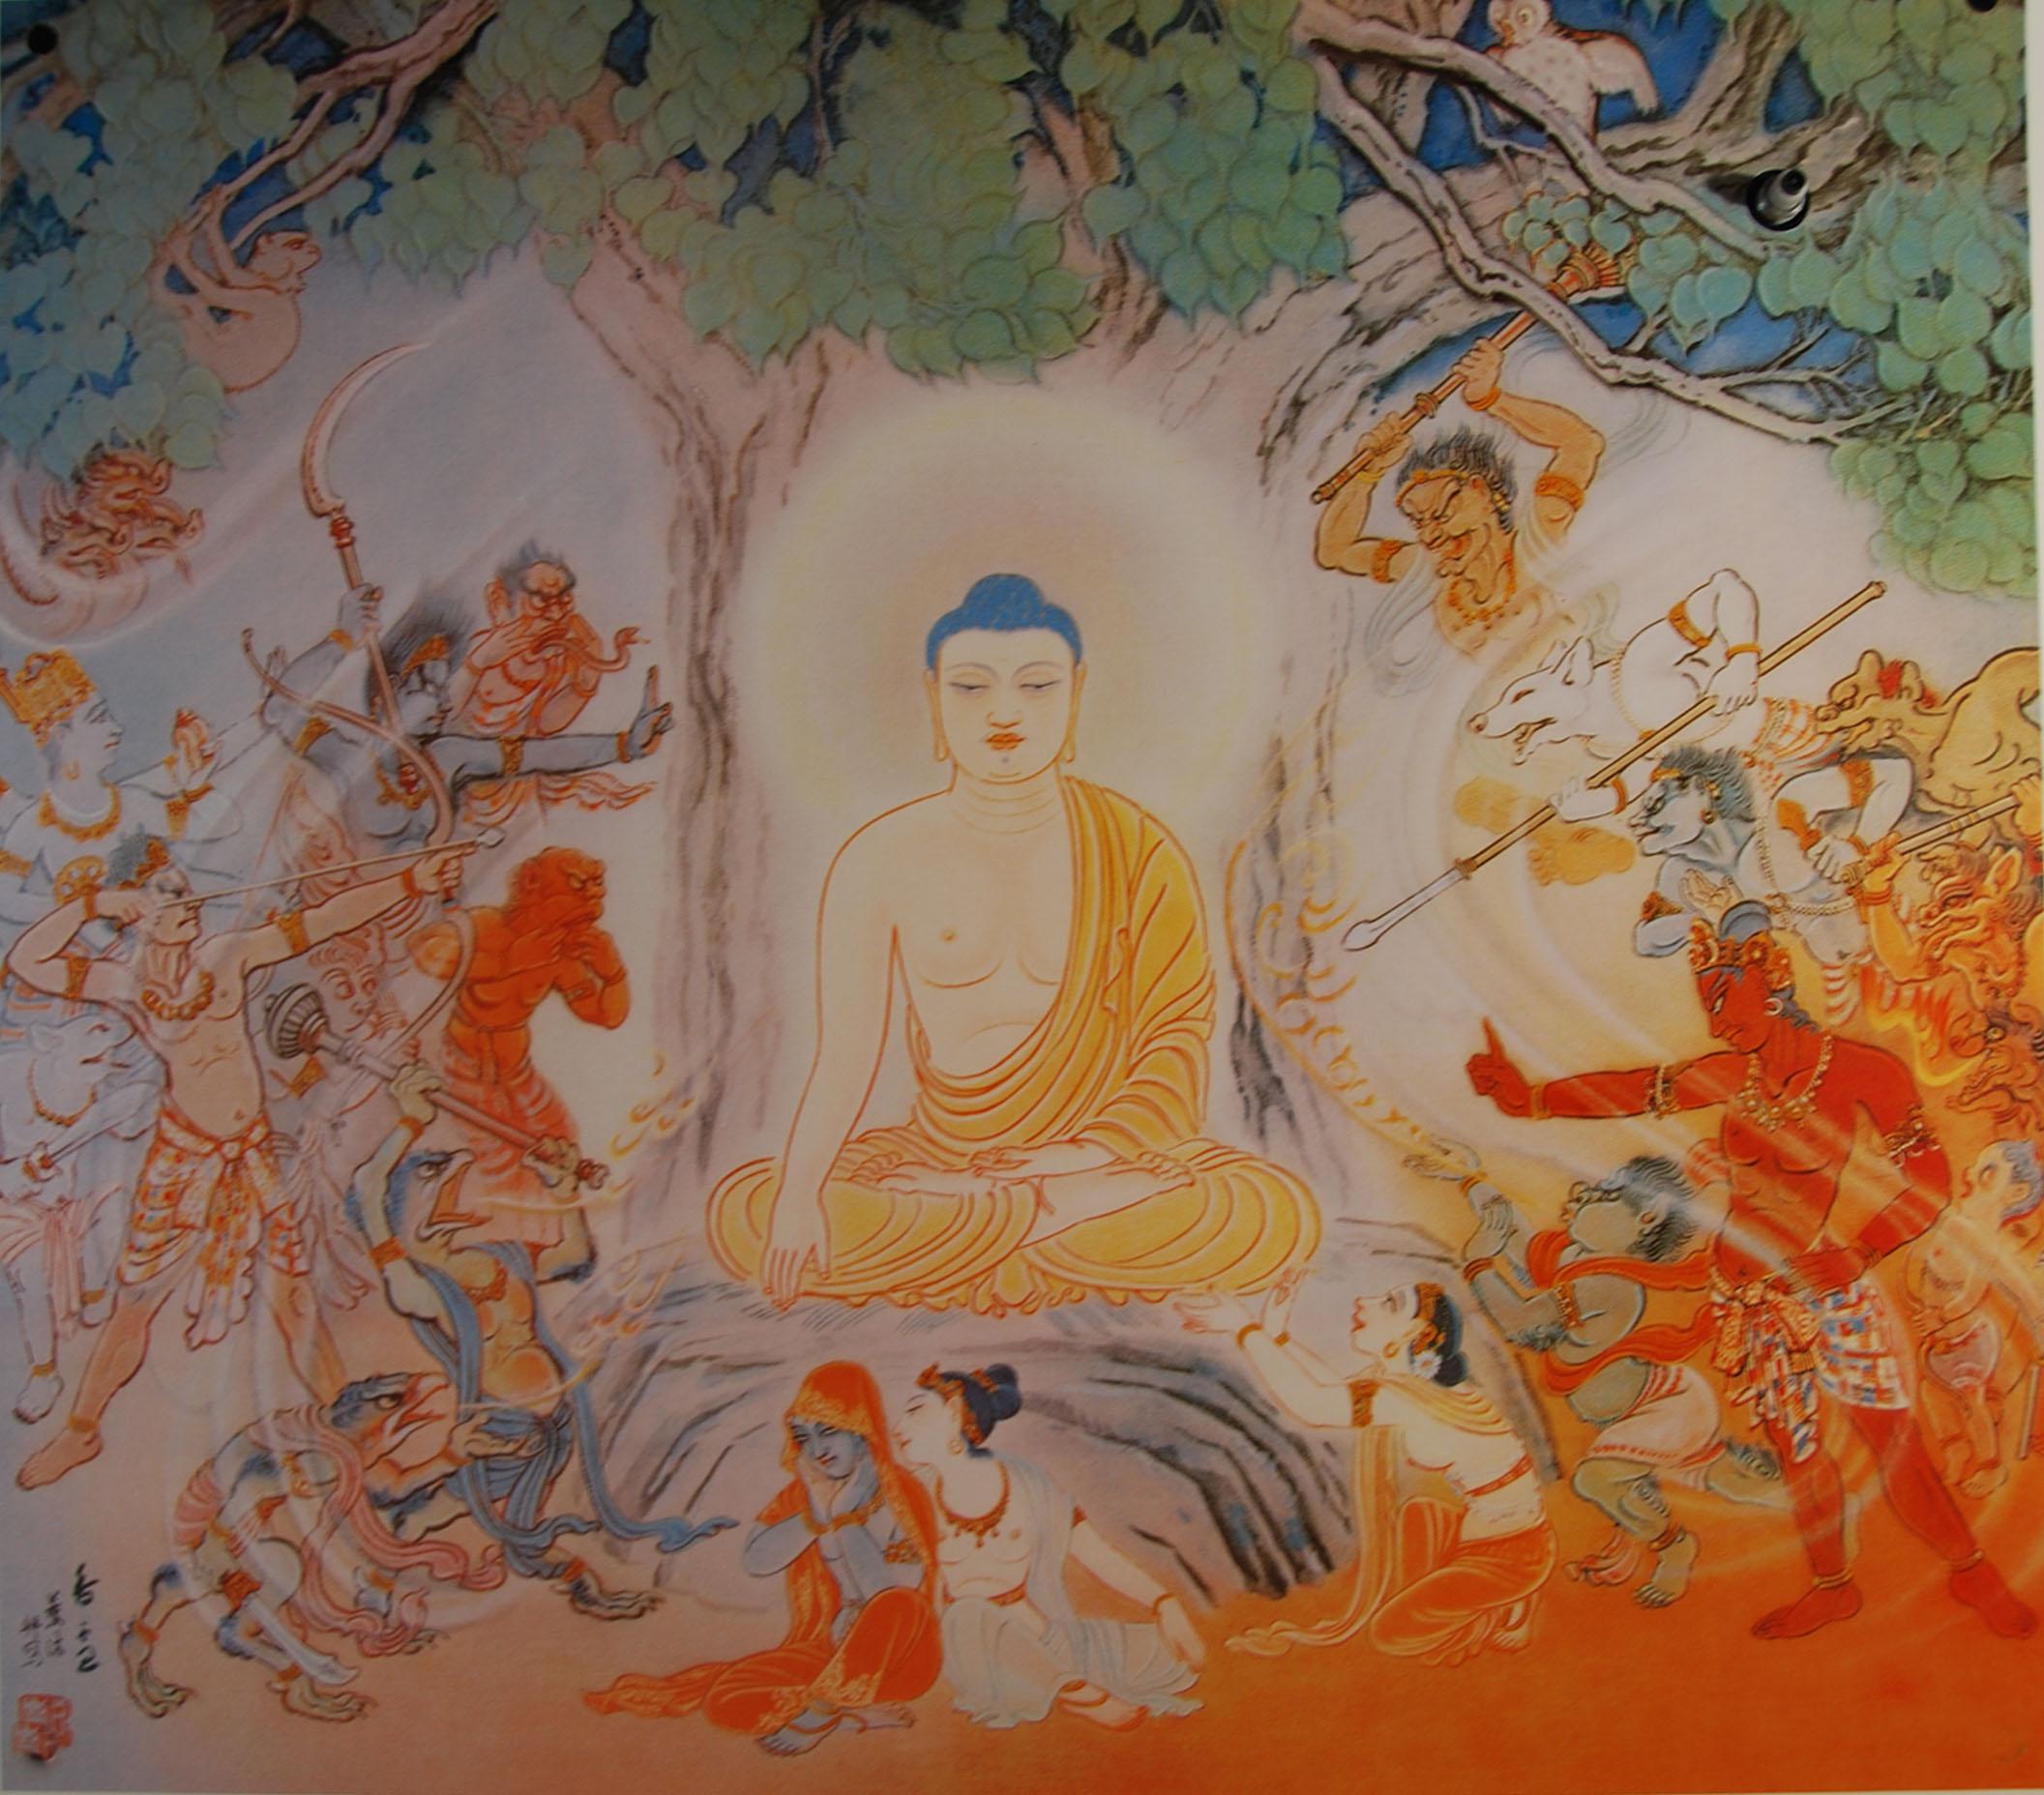 Mara's Attack on the Buddha